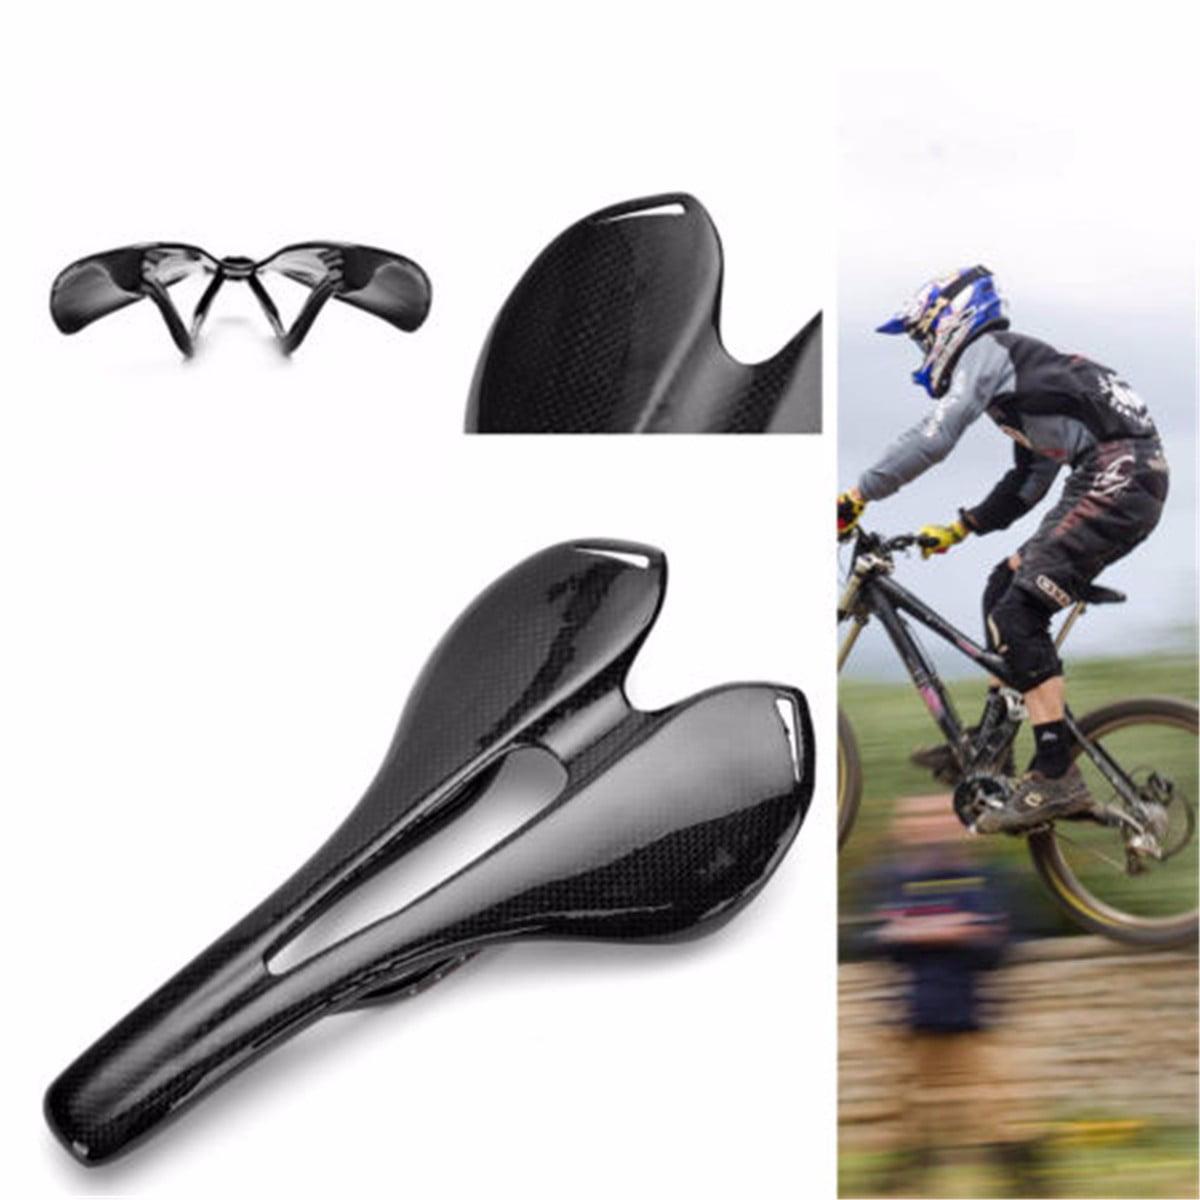 13x27cm Ultralight Full Carbon Fiber Mountain MTB Road Bike Bicycle Cycling Saddle Seat